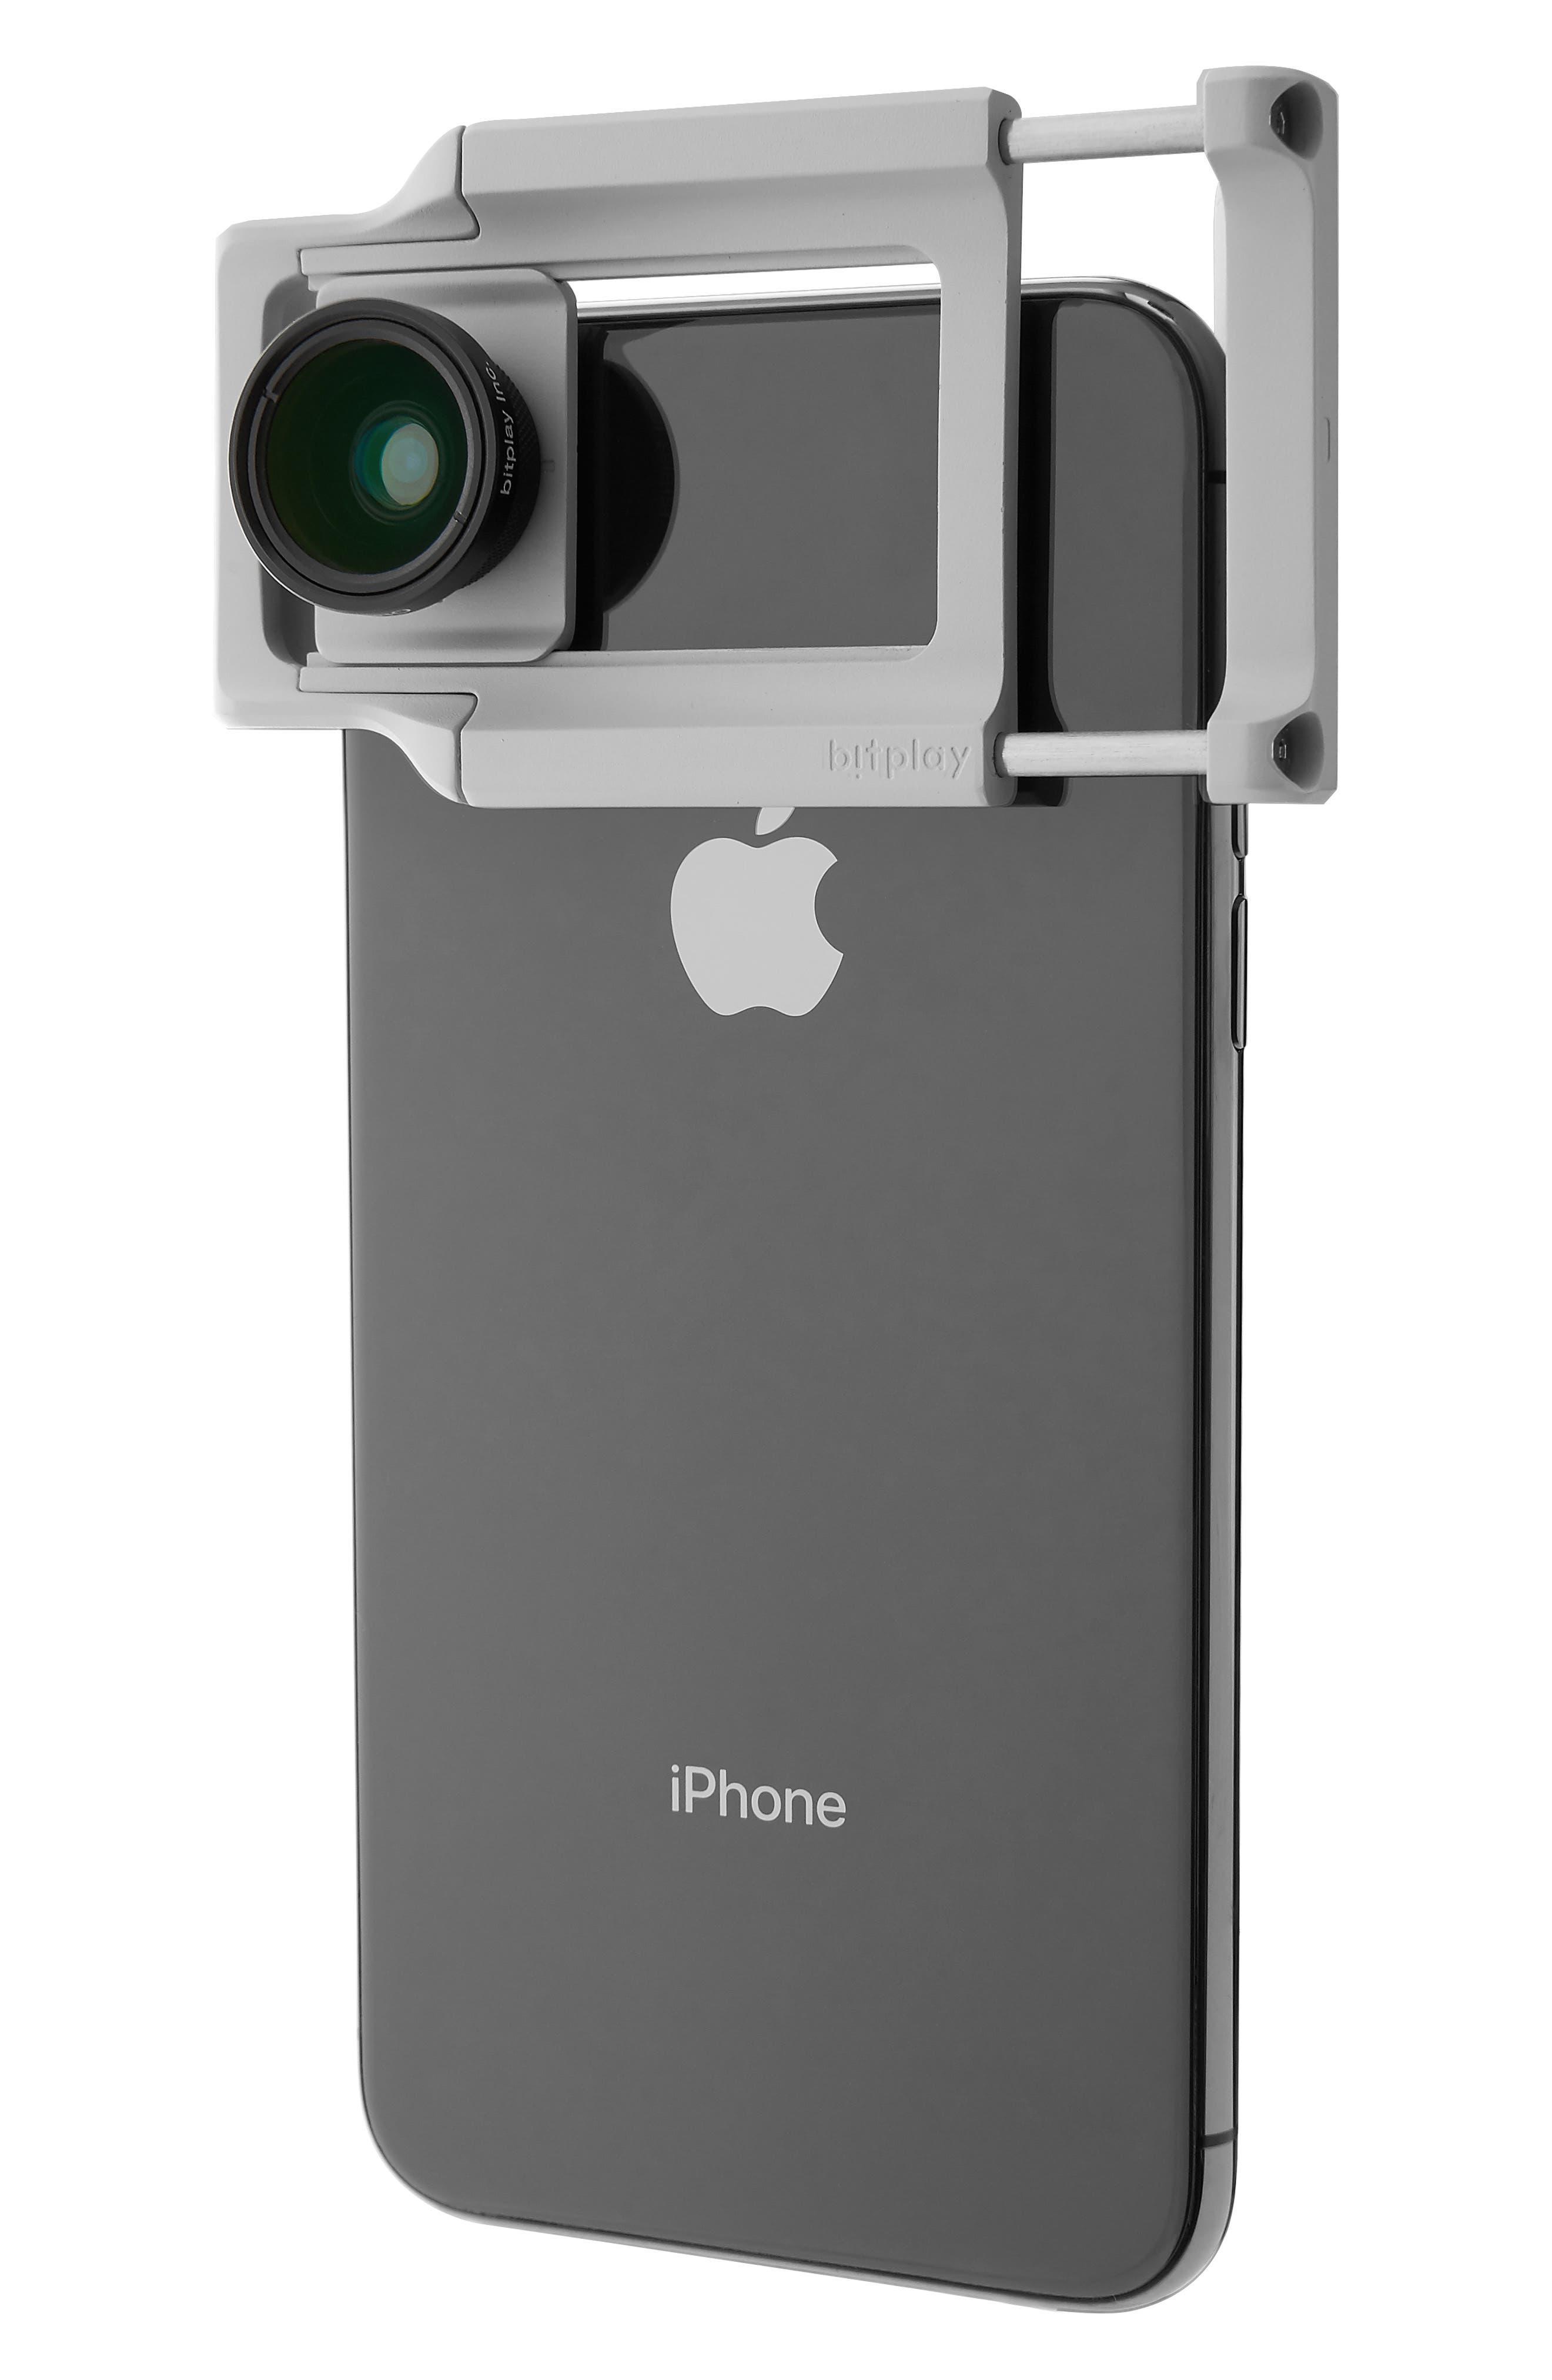 AllClip Lens Holder + Wide Angle Lens,                             Main thumbnail 1, color,                             SILVER